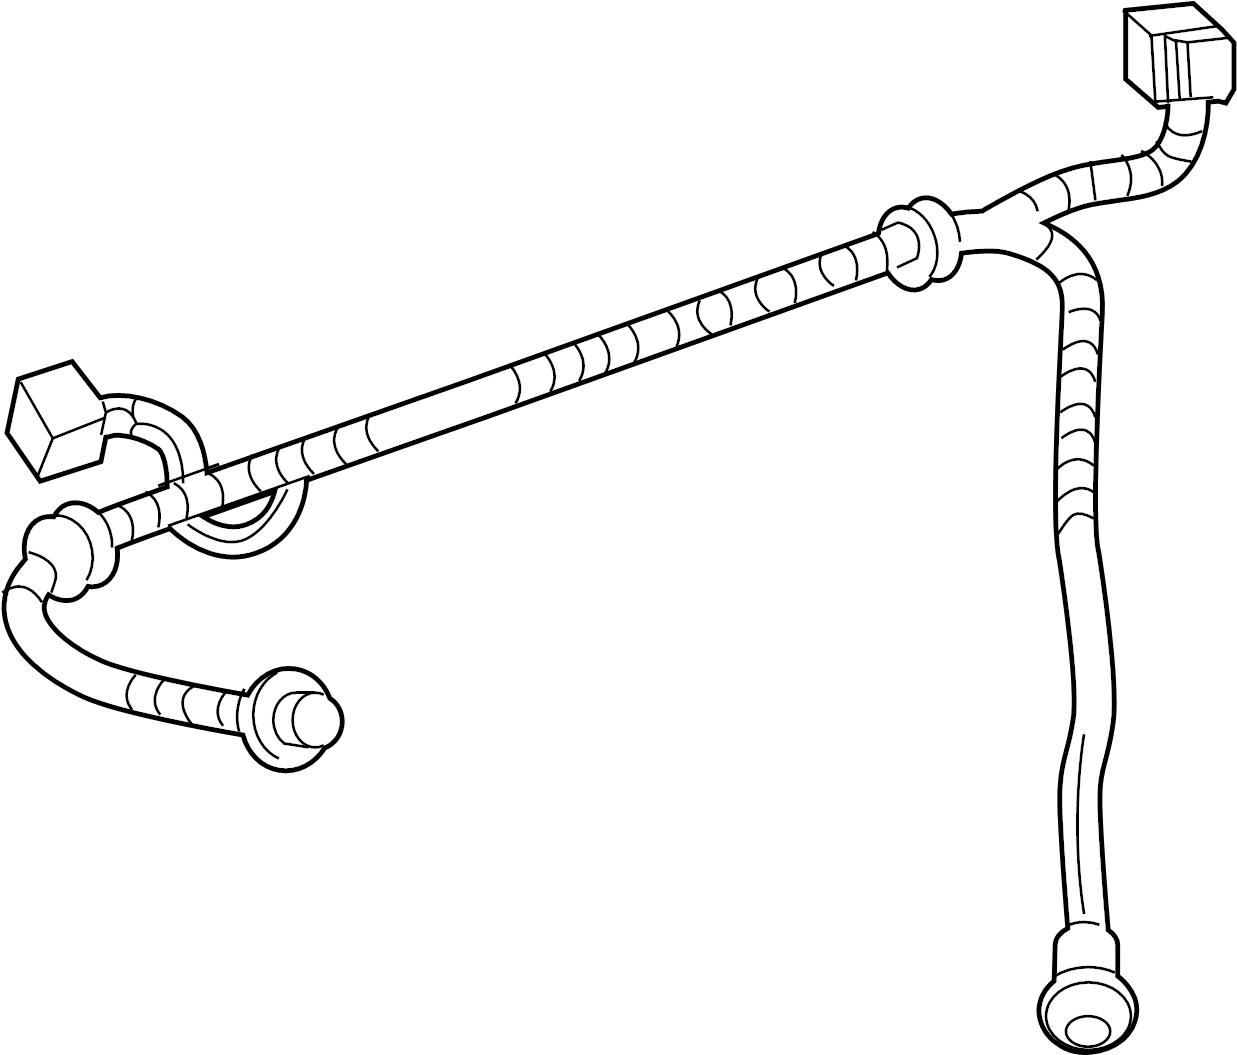 2010 chevrolet silverado 1500 harness  w  o dual rr wheels